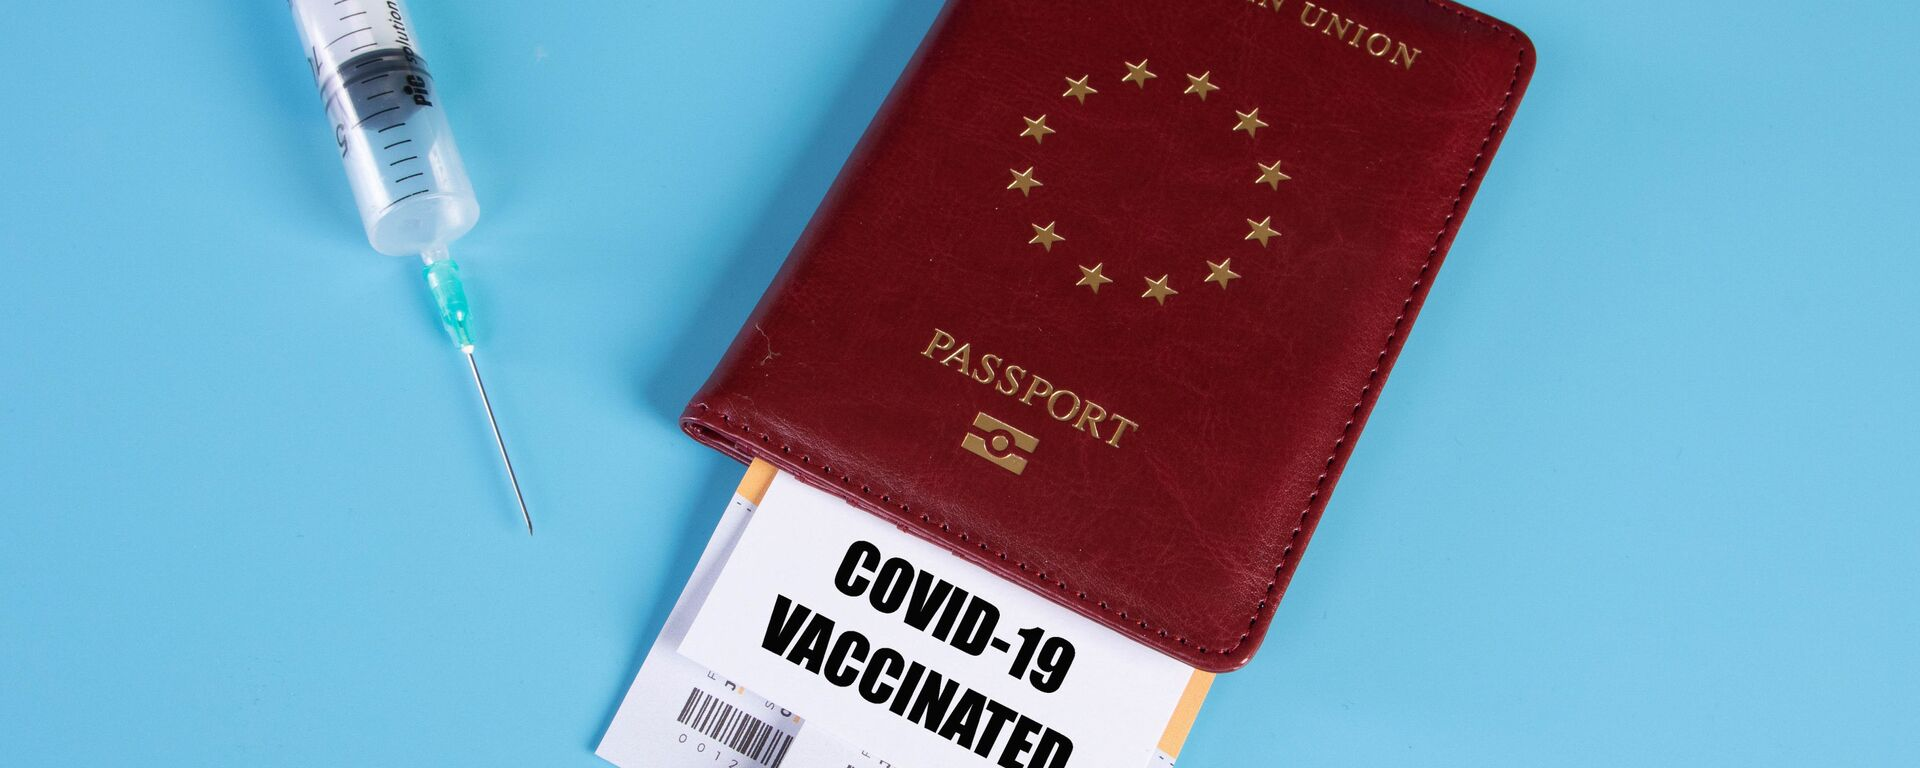 Certificat de vaccination (image d'illustration) - Sputnik France, 1920, 20.07.2021